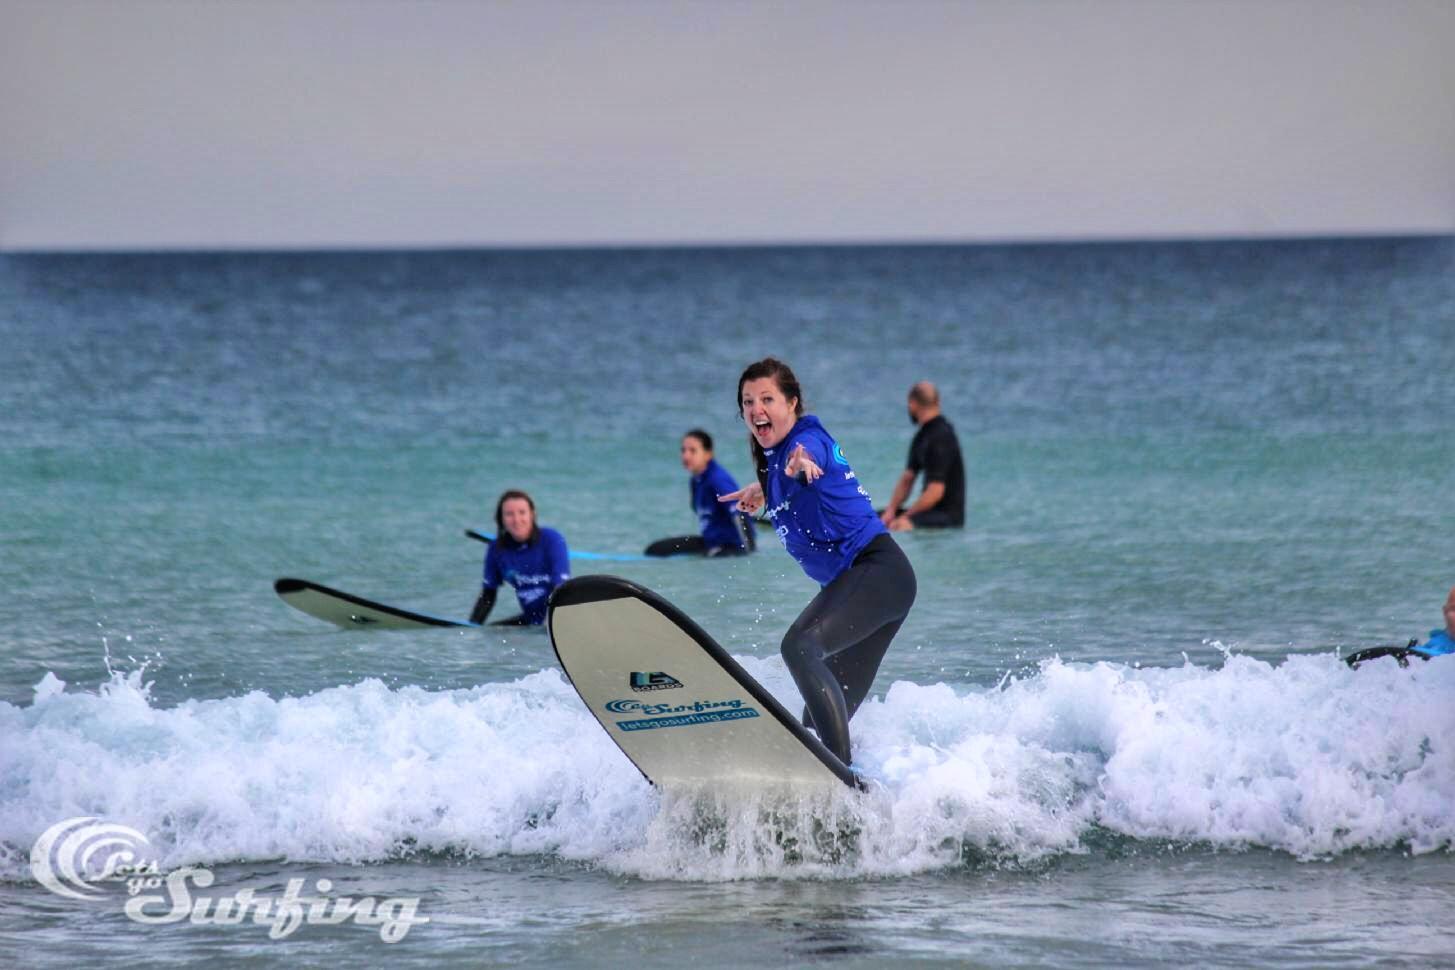 Bondi Beach surfing thesweetwanderlust.com